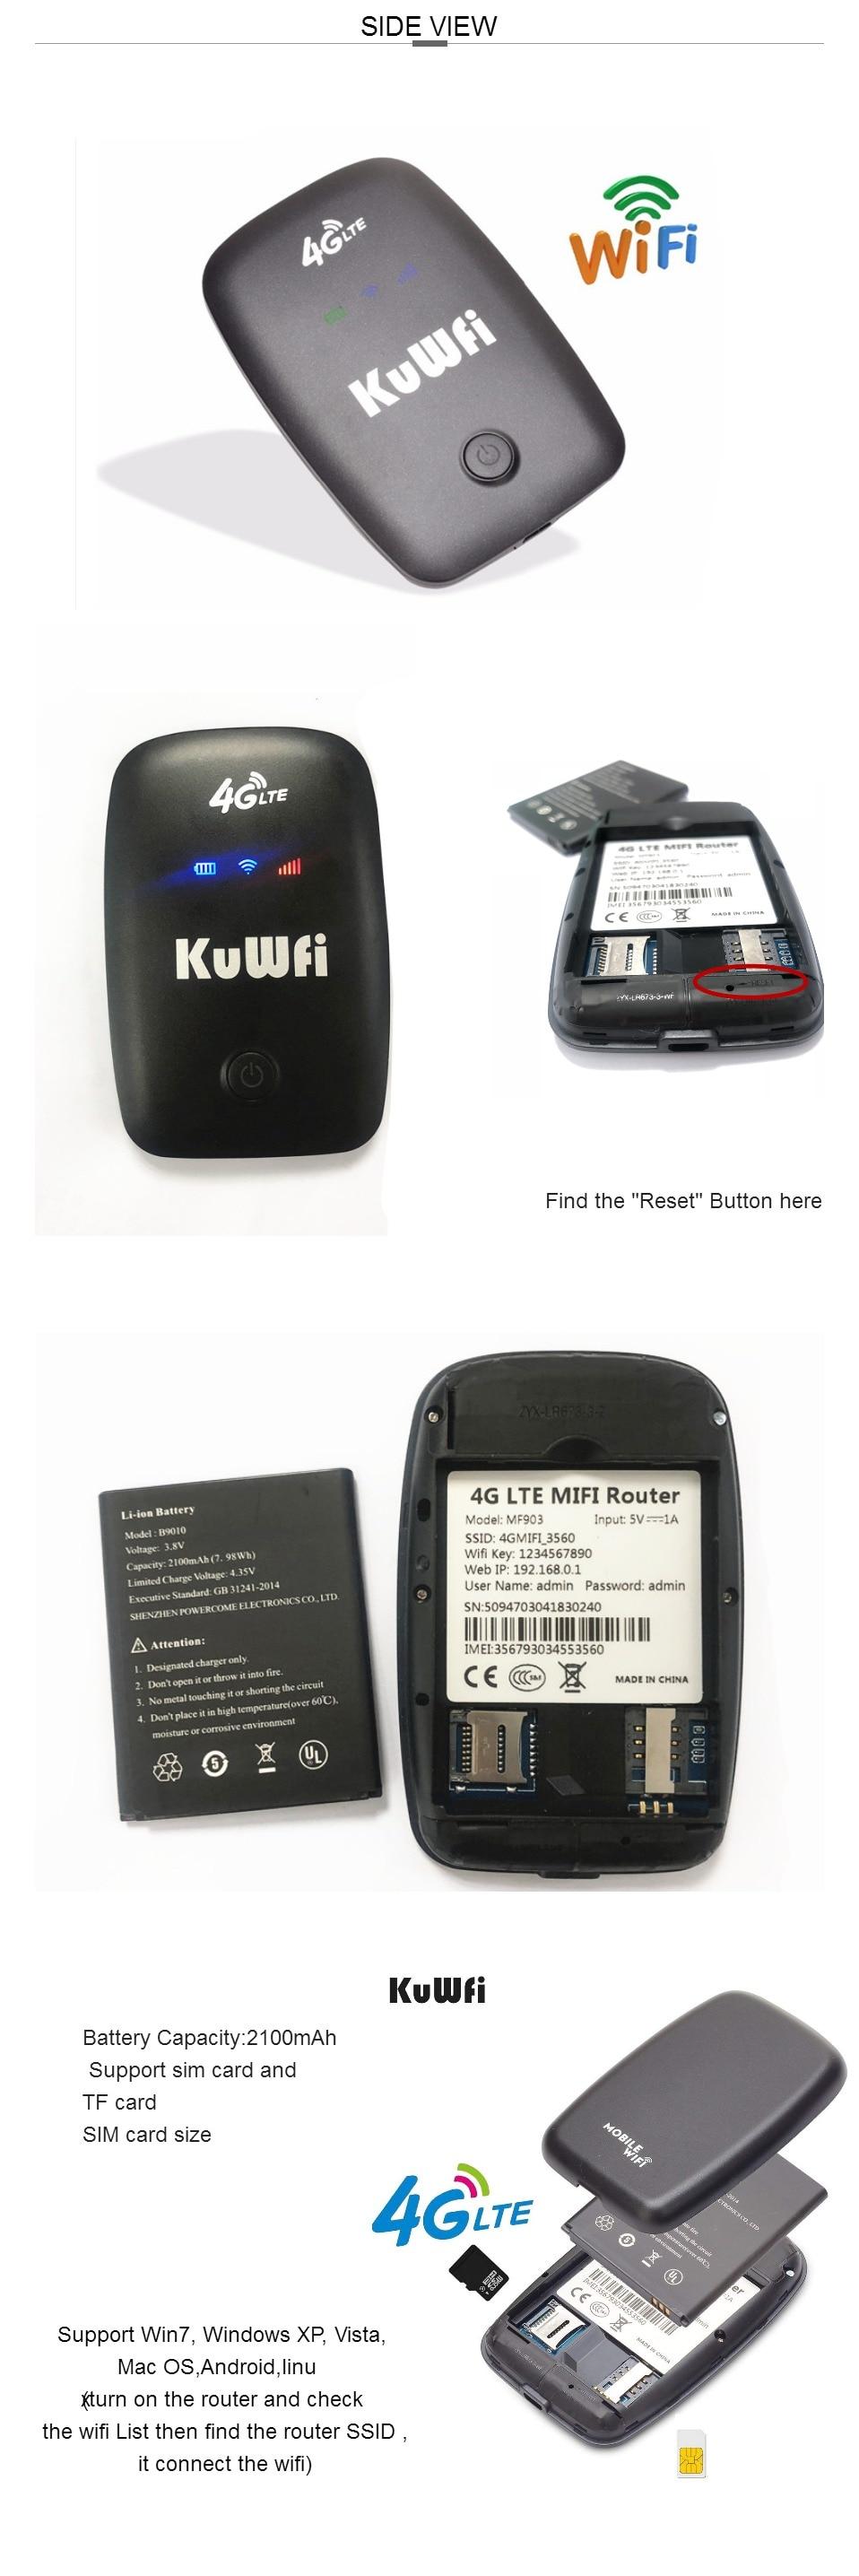 KuWFi Unlocked 3G 4G Wifi Router Hotspot Mobile Portable Pocket Wireless  Car Mifi Modem 2000mAh Battery Outdoor Wifi Router